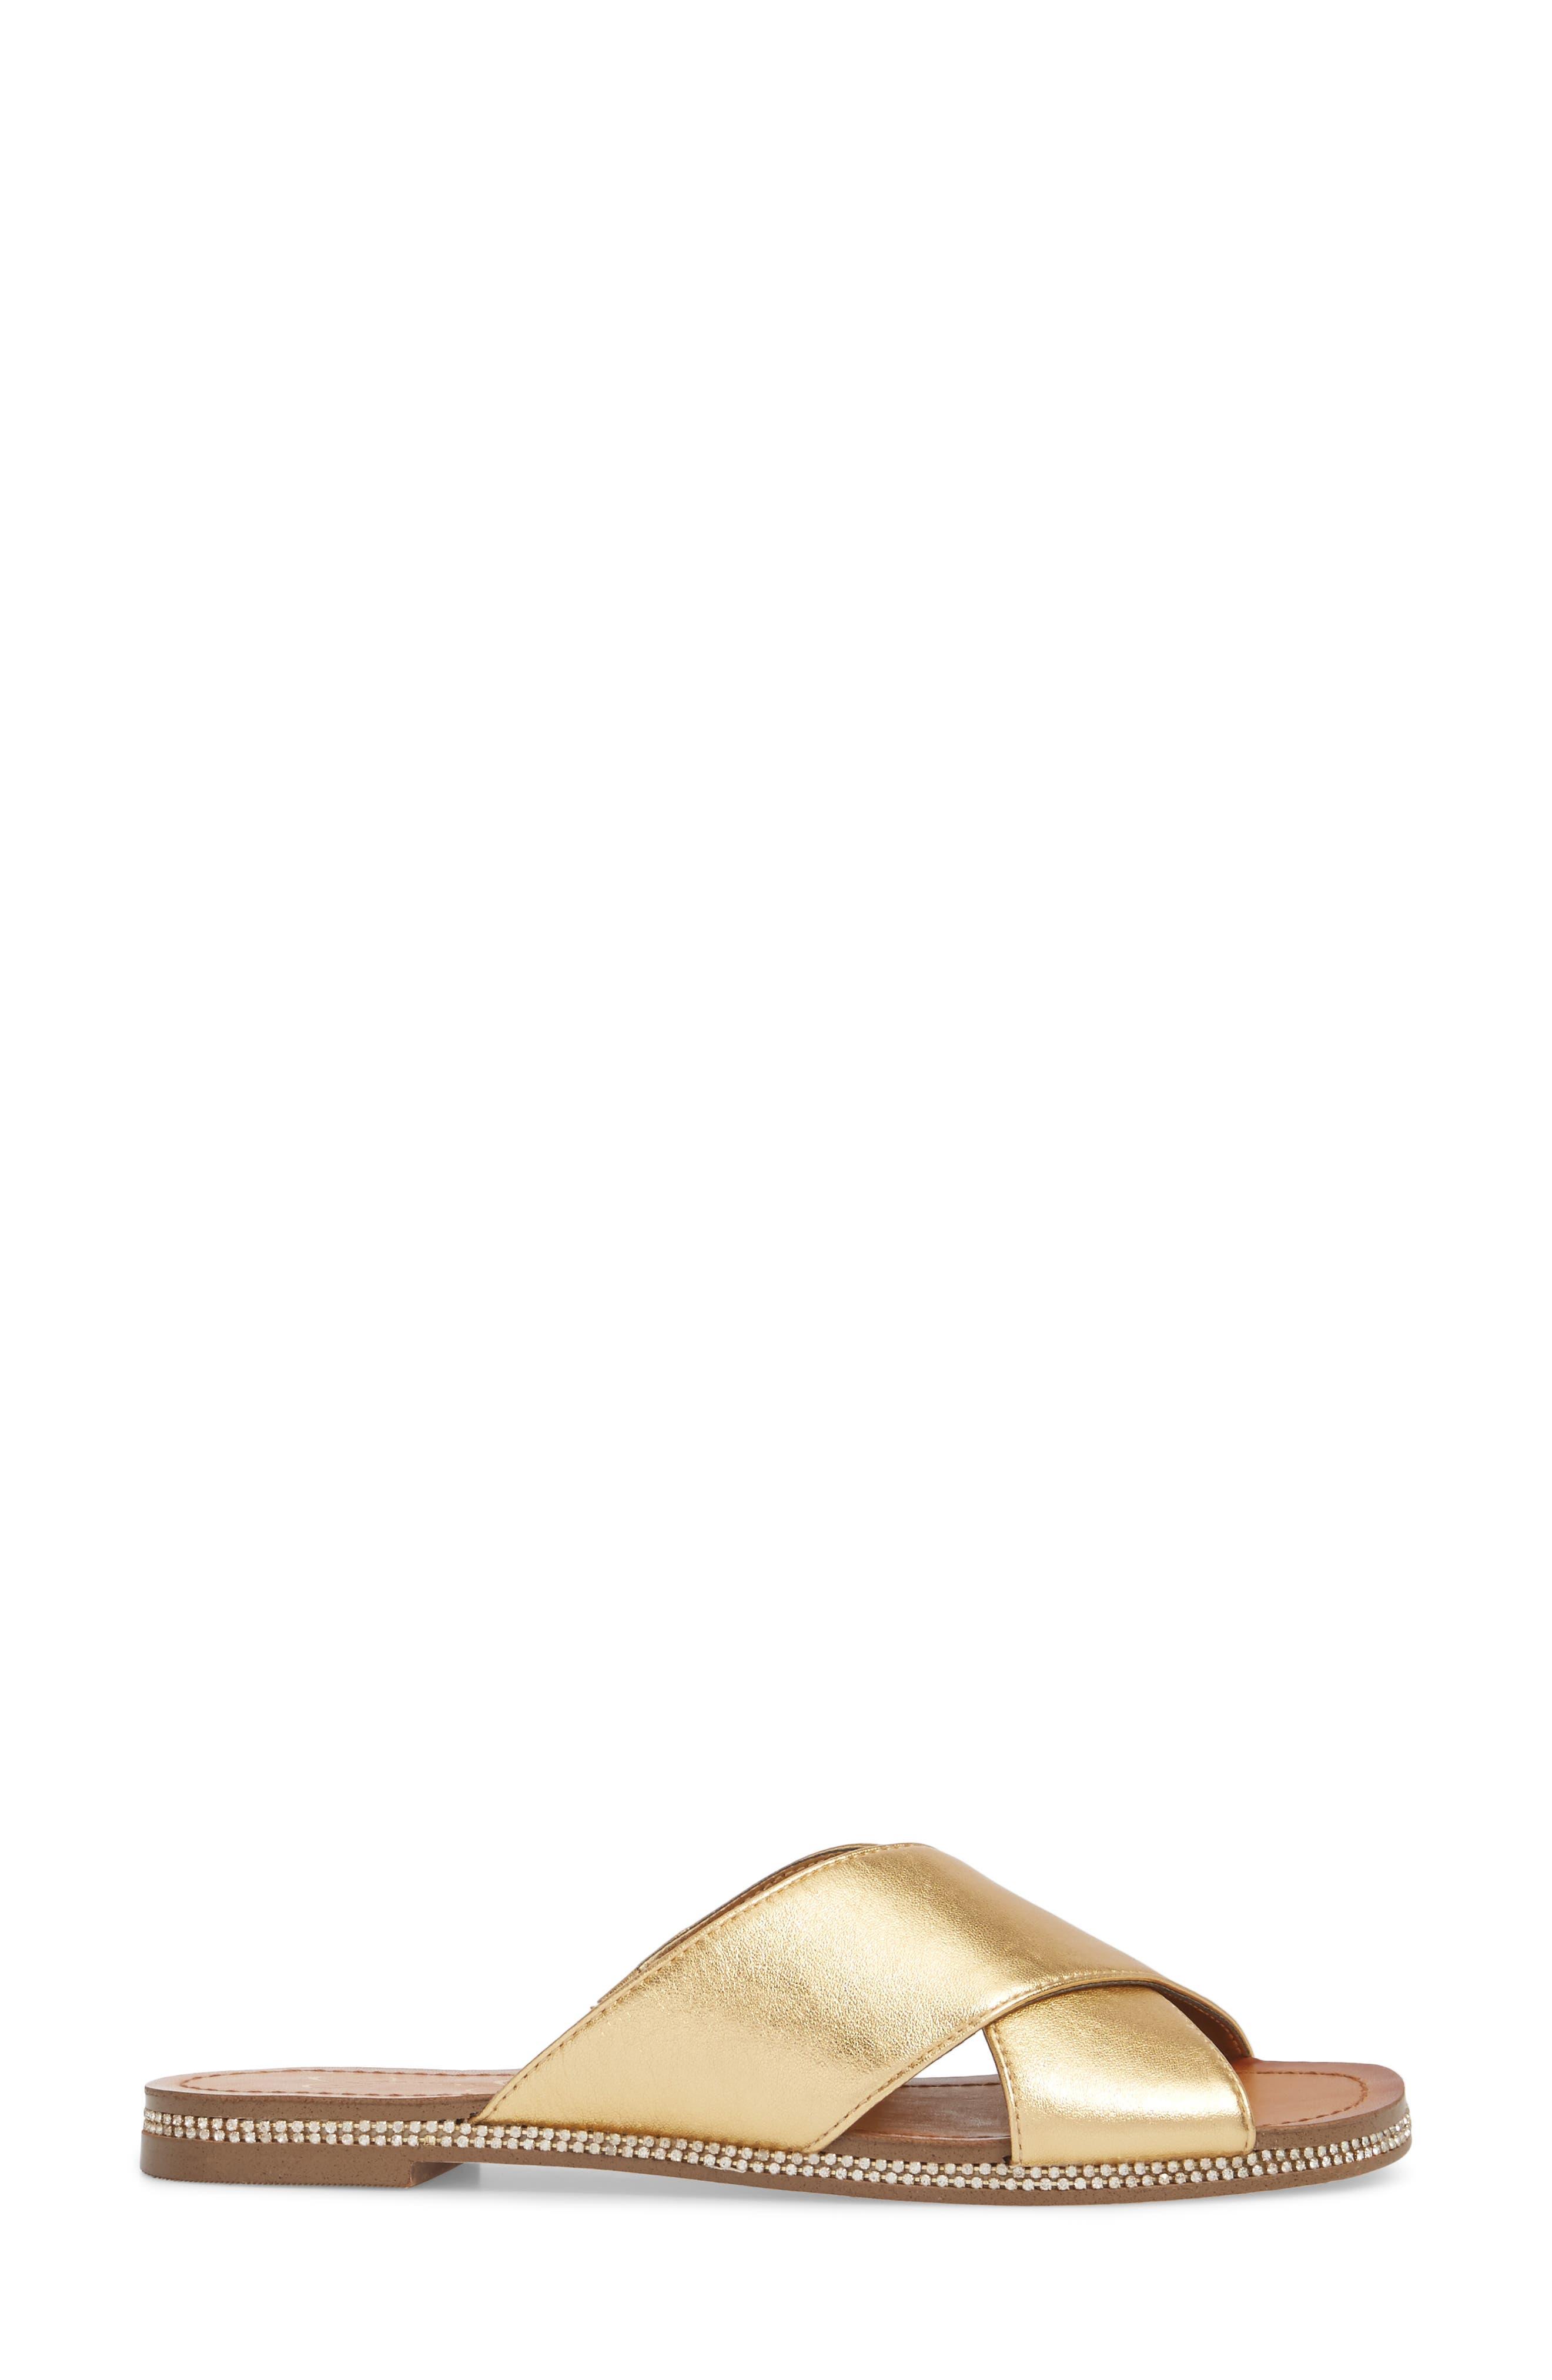 Alternate Image 3  - Jessica Simpson Brinella Sandal (Women)